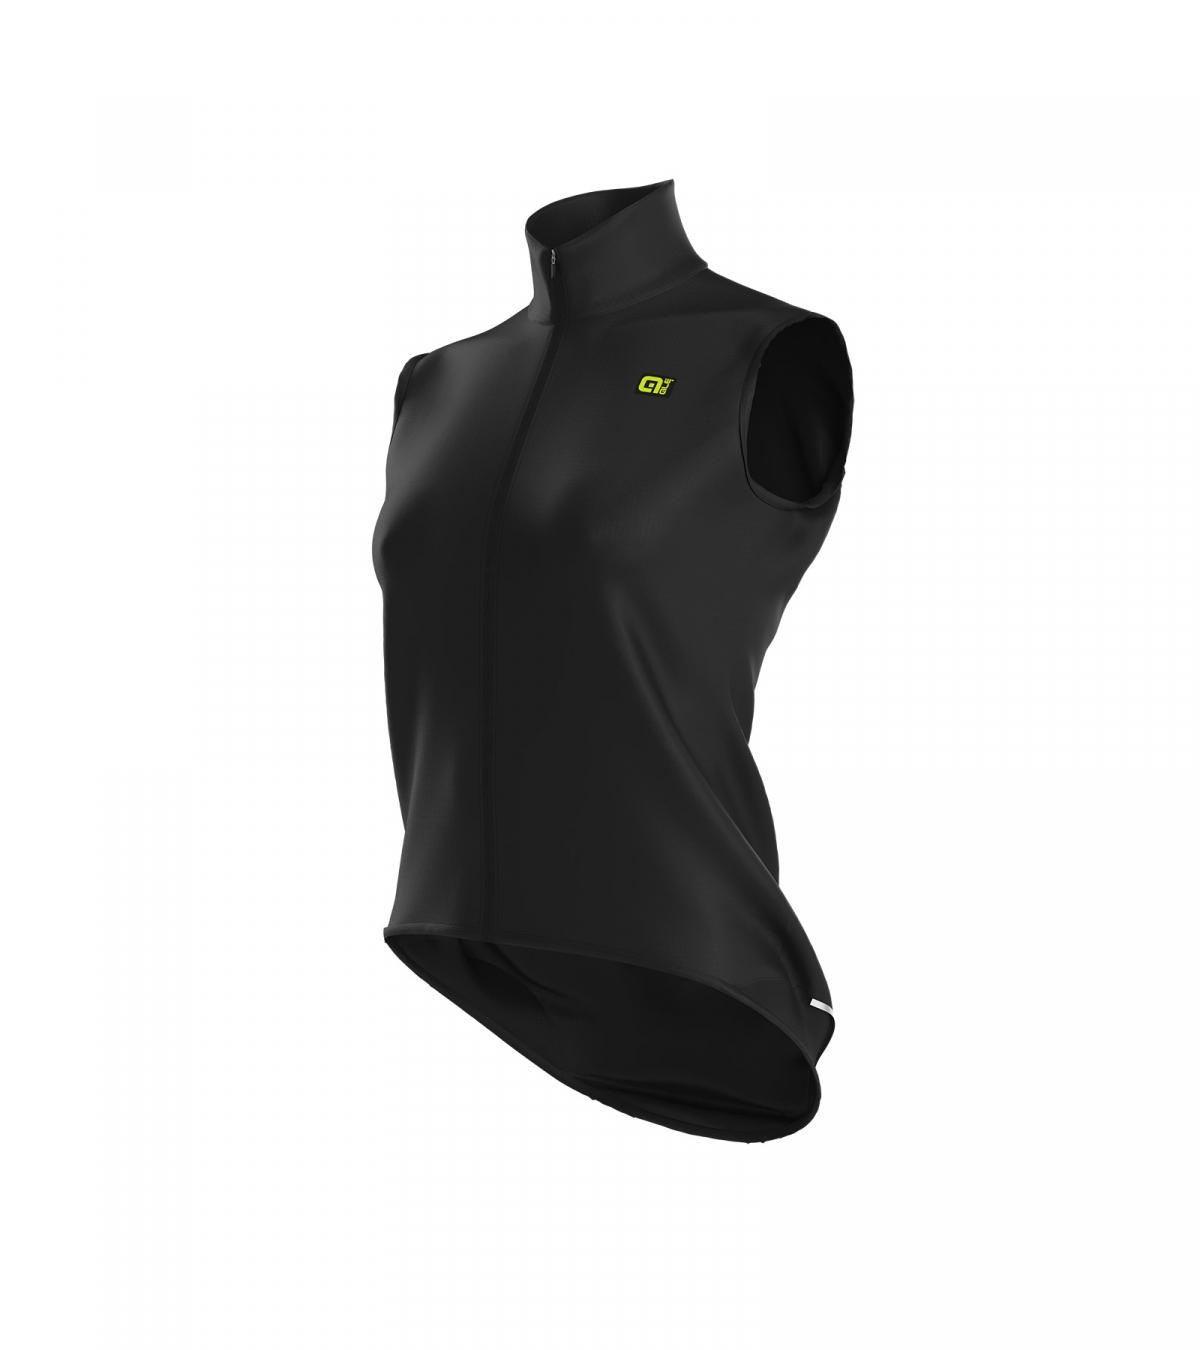 L11240114-short-sleeve-rainproof-vest-klimatik-elements-black-blue-side_1200_1350